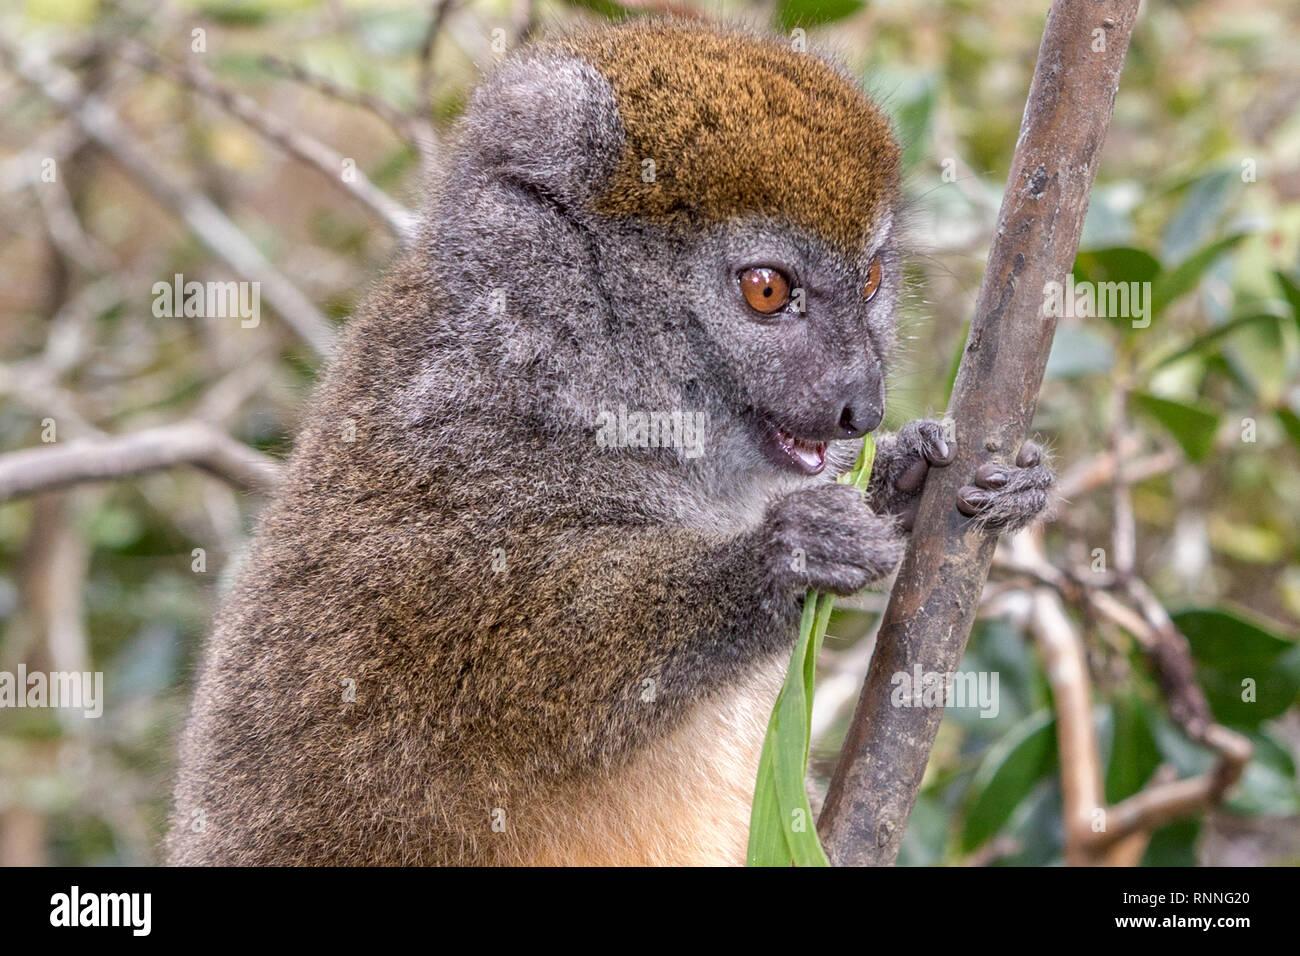 Bamboo Lemur or Gentle lemur, Hapalemur, Lemur Island, Mantandia National Park, Madagascar: eating bamboo leaves - Stock Image